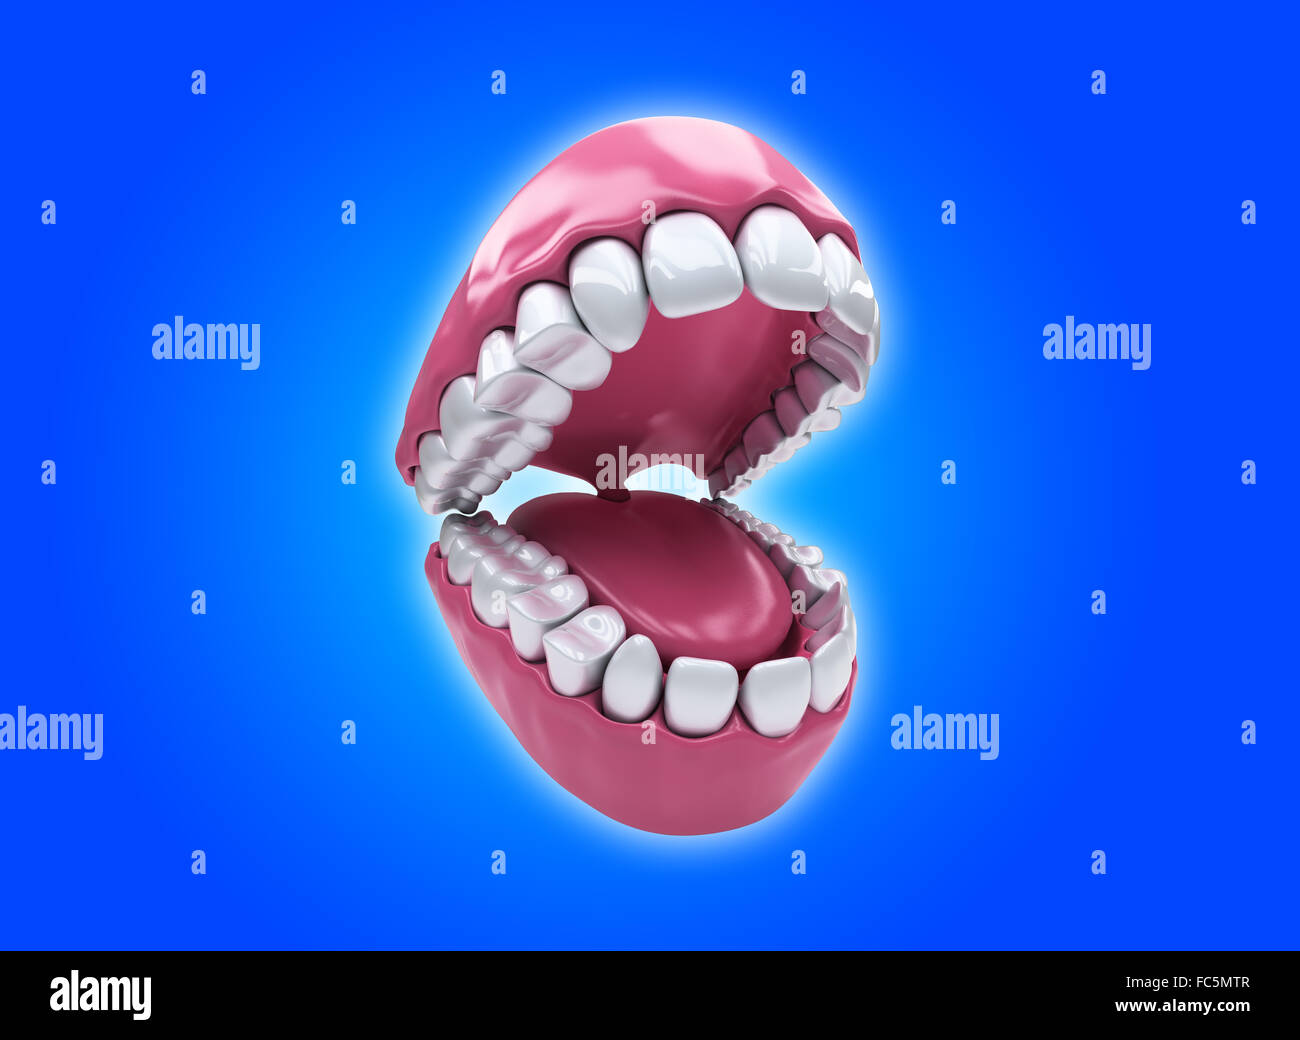 Bicuspid Stockfotos & Bicuspid Bilder - Alamy